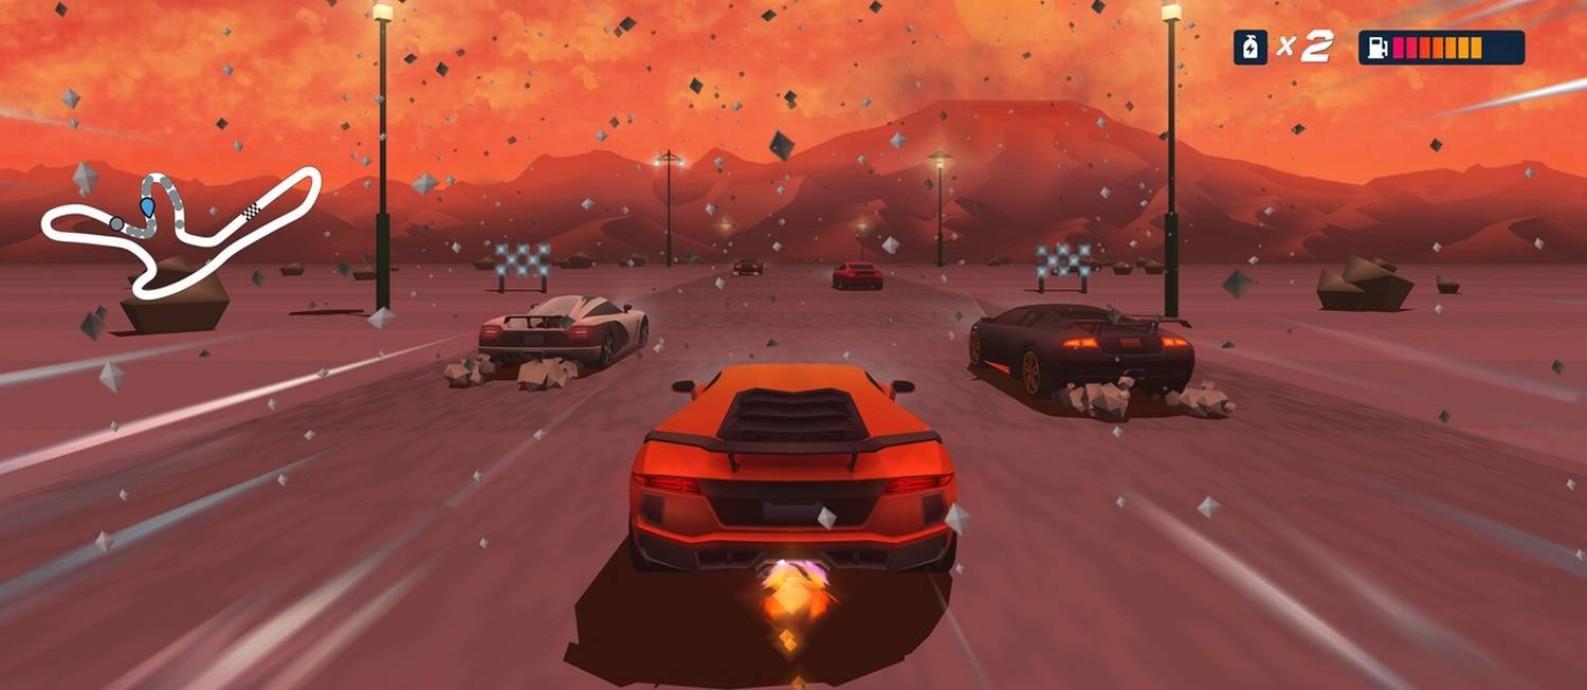 O game Horizon Chade Turbo